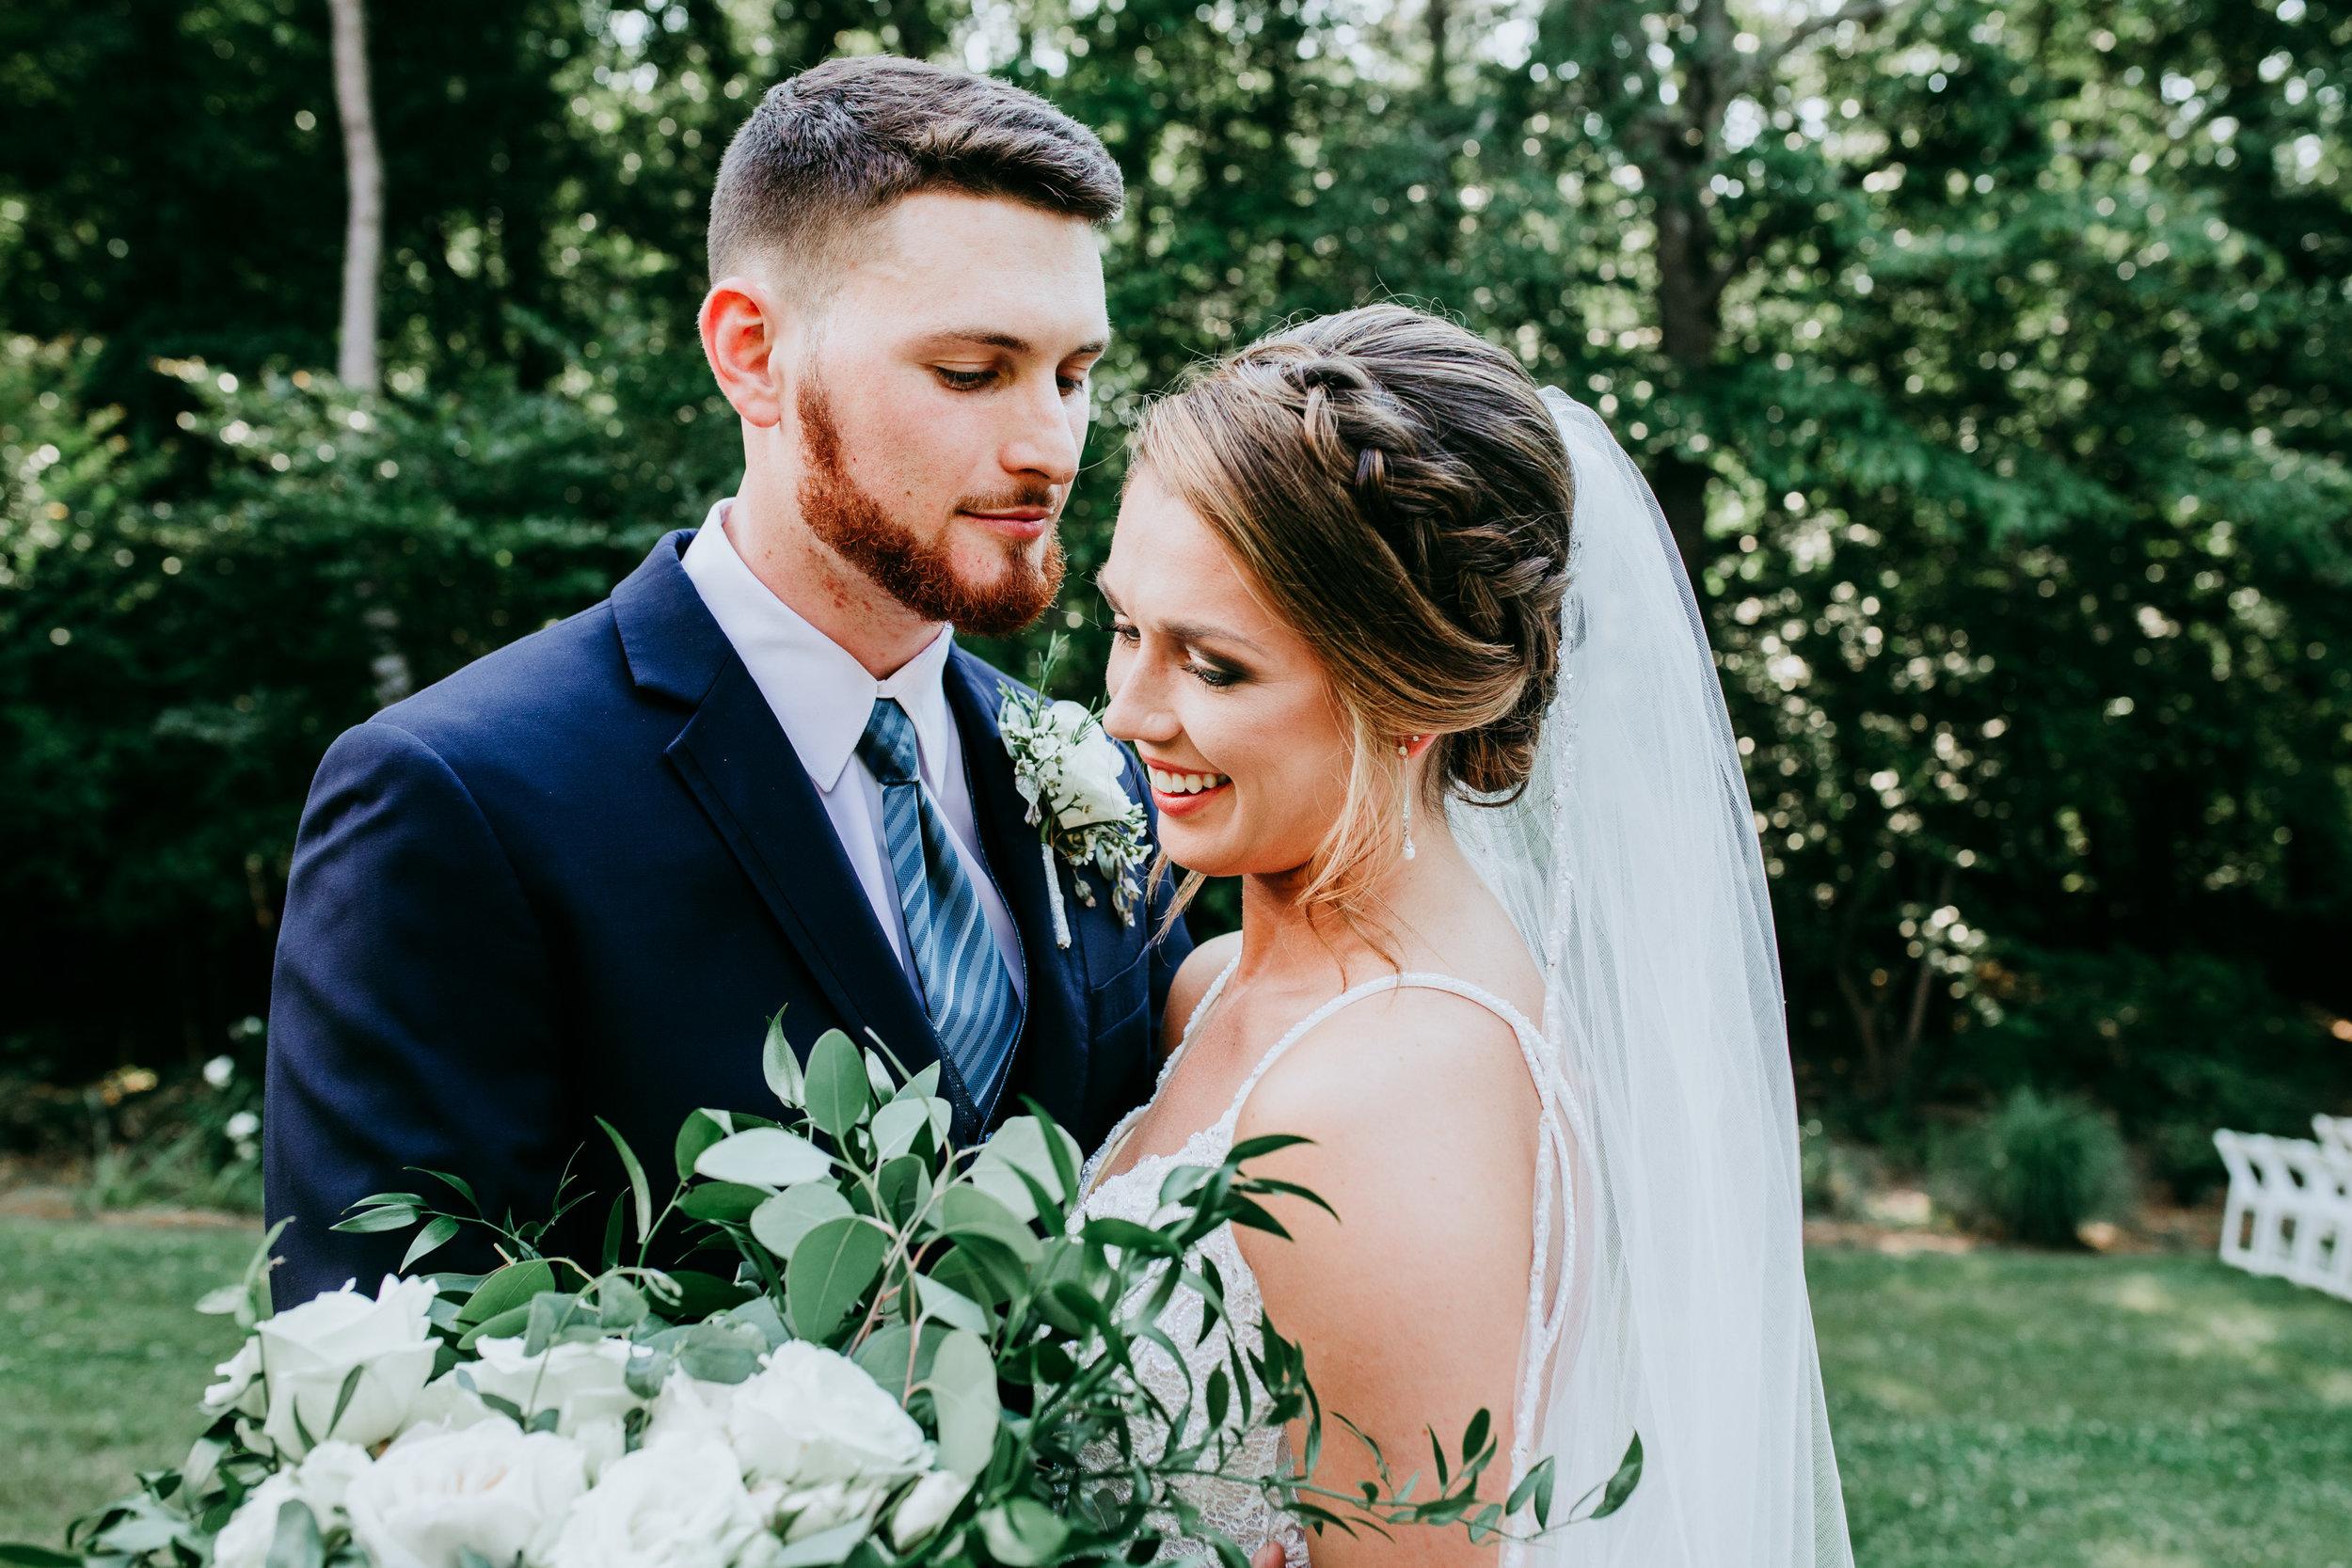 cute-bride-and-groom-photo-ideas.jpg